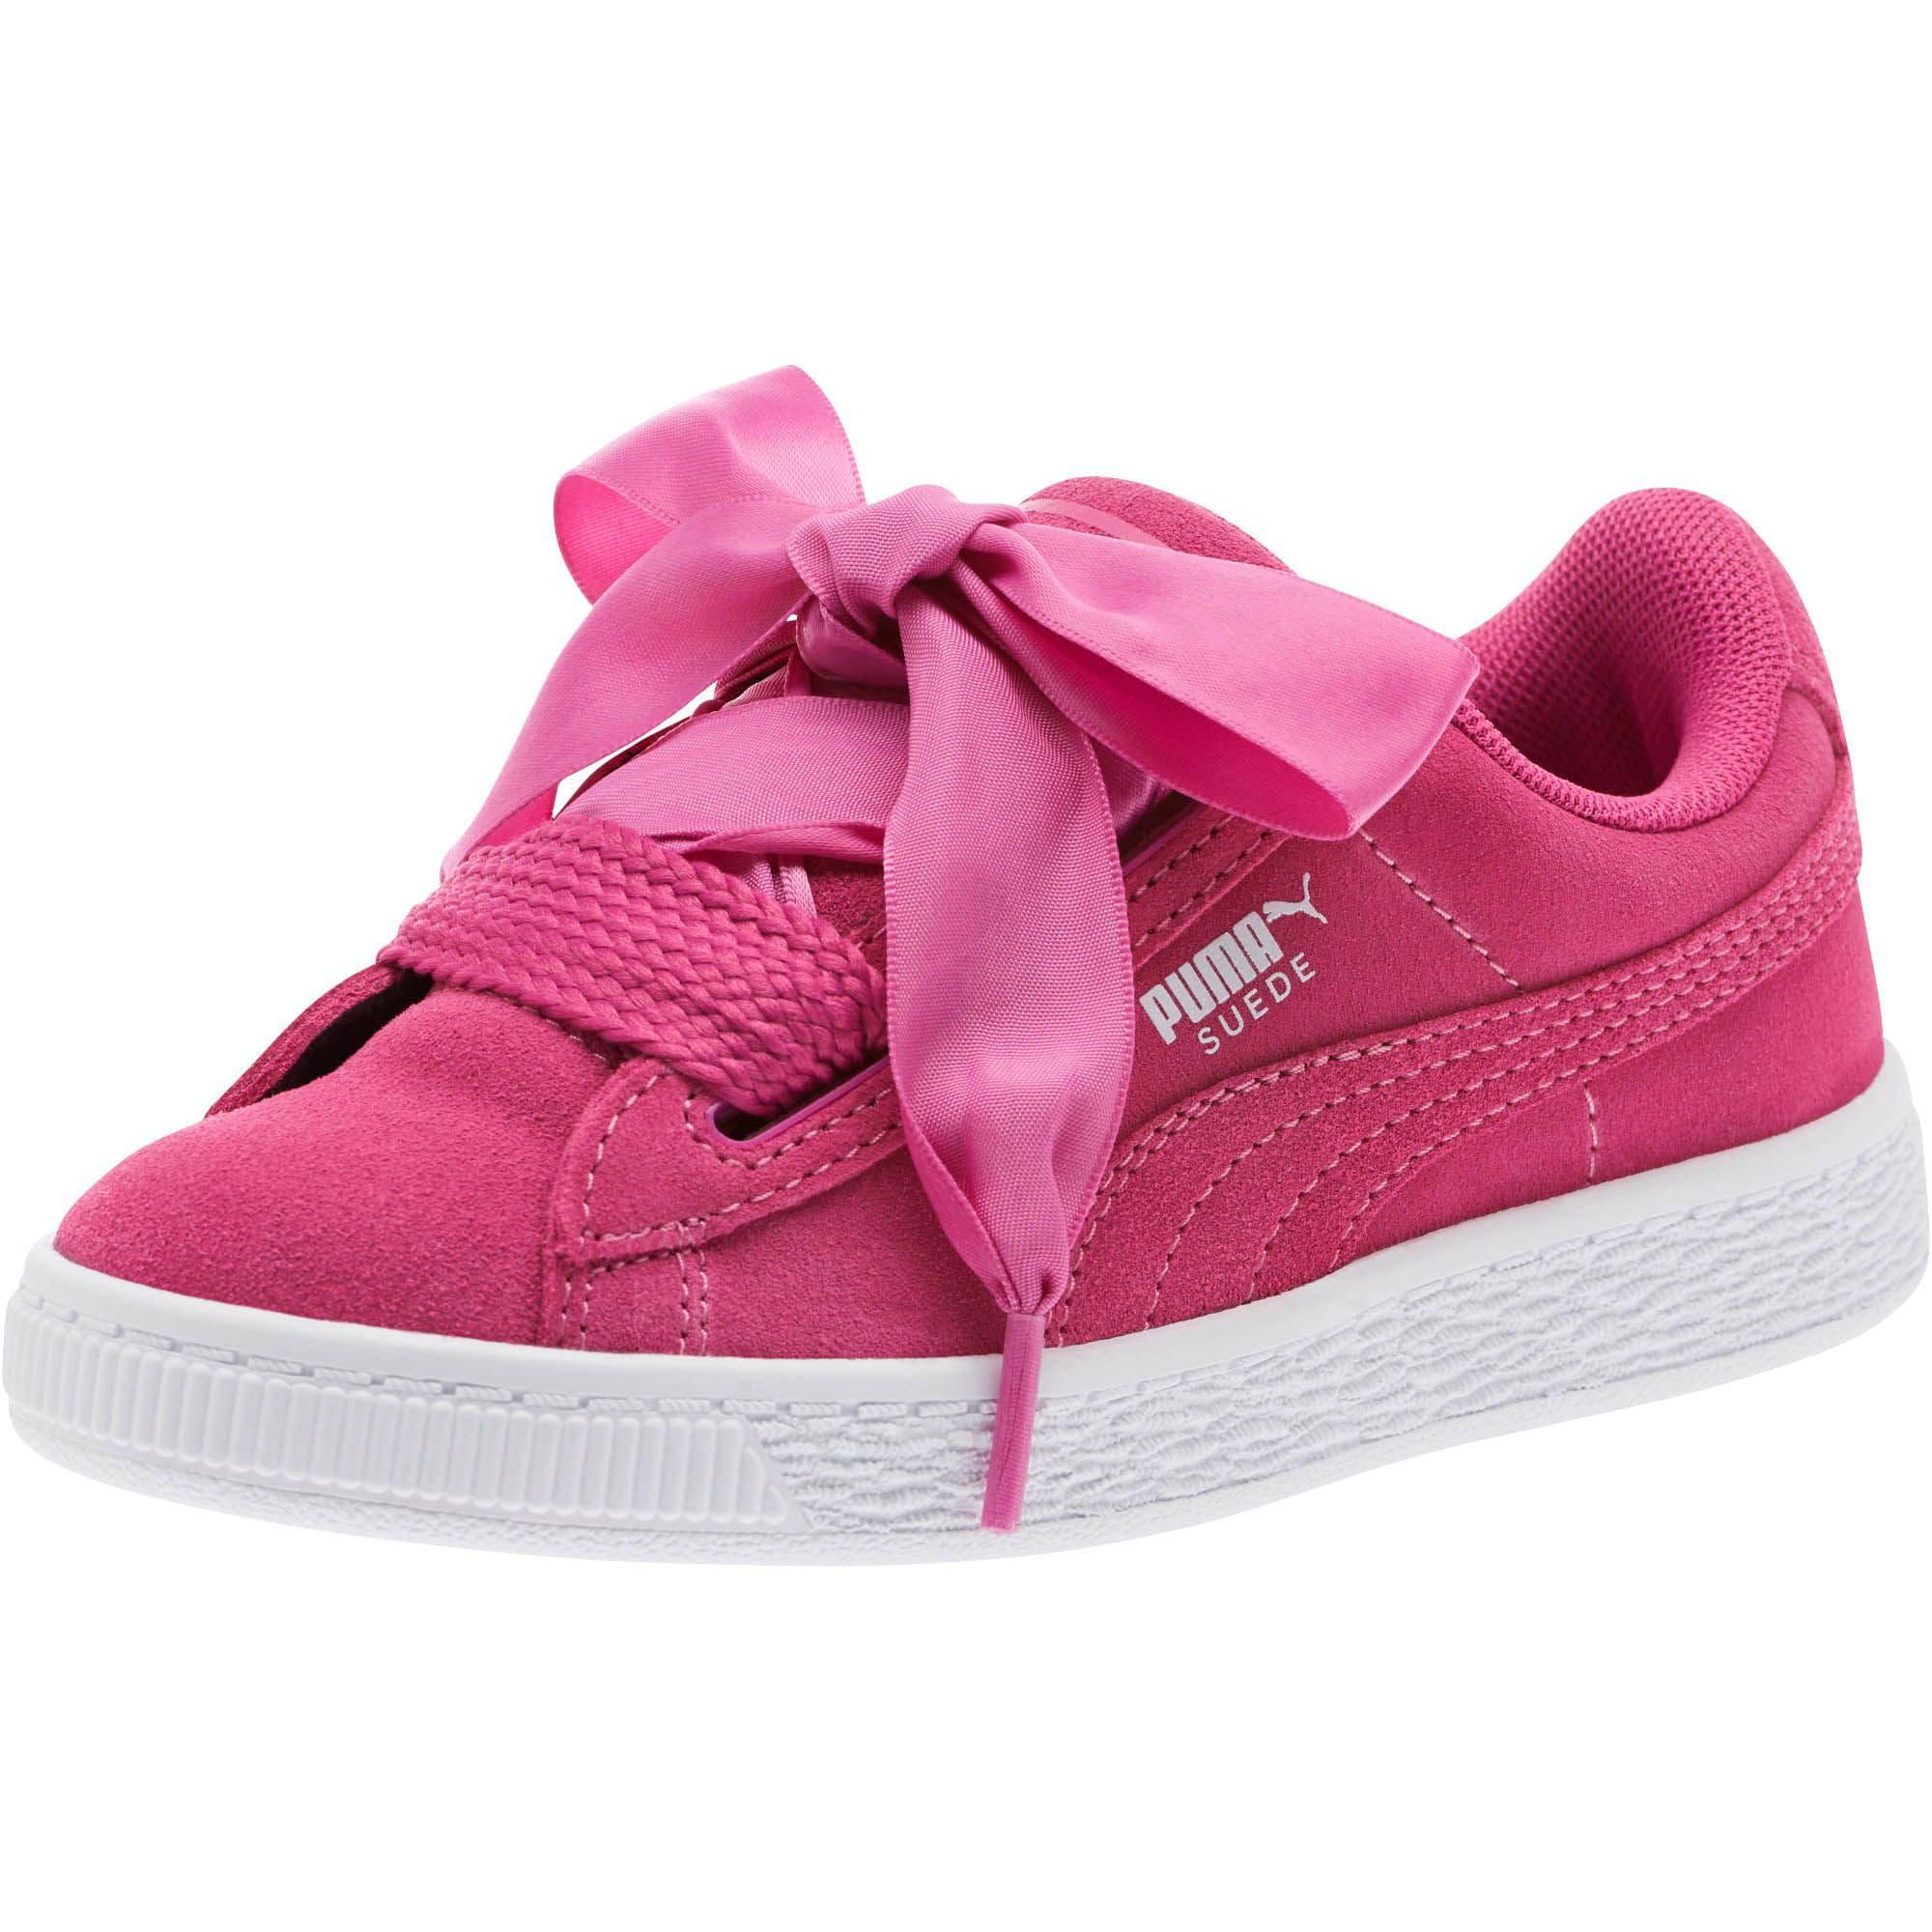 the best attitude 3fd88 68129 Suede Heart Little Kids' Shoes